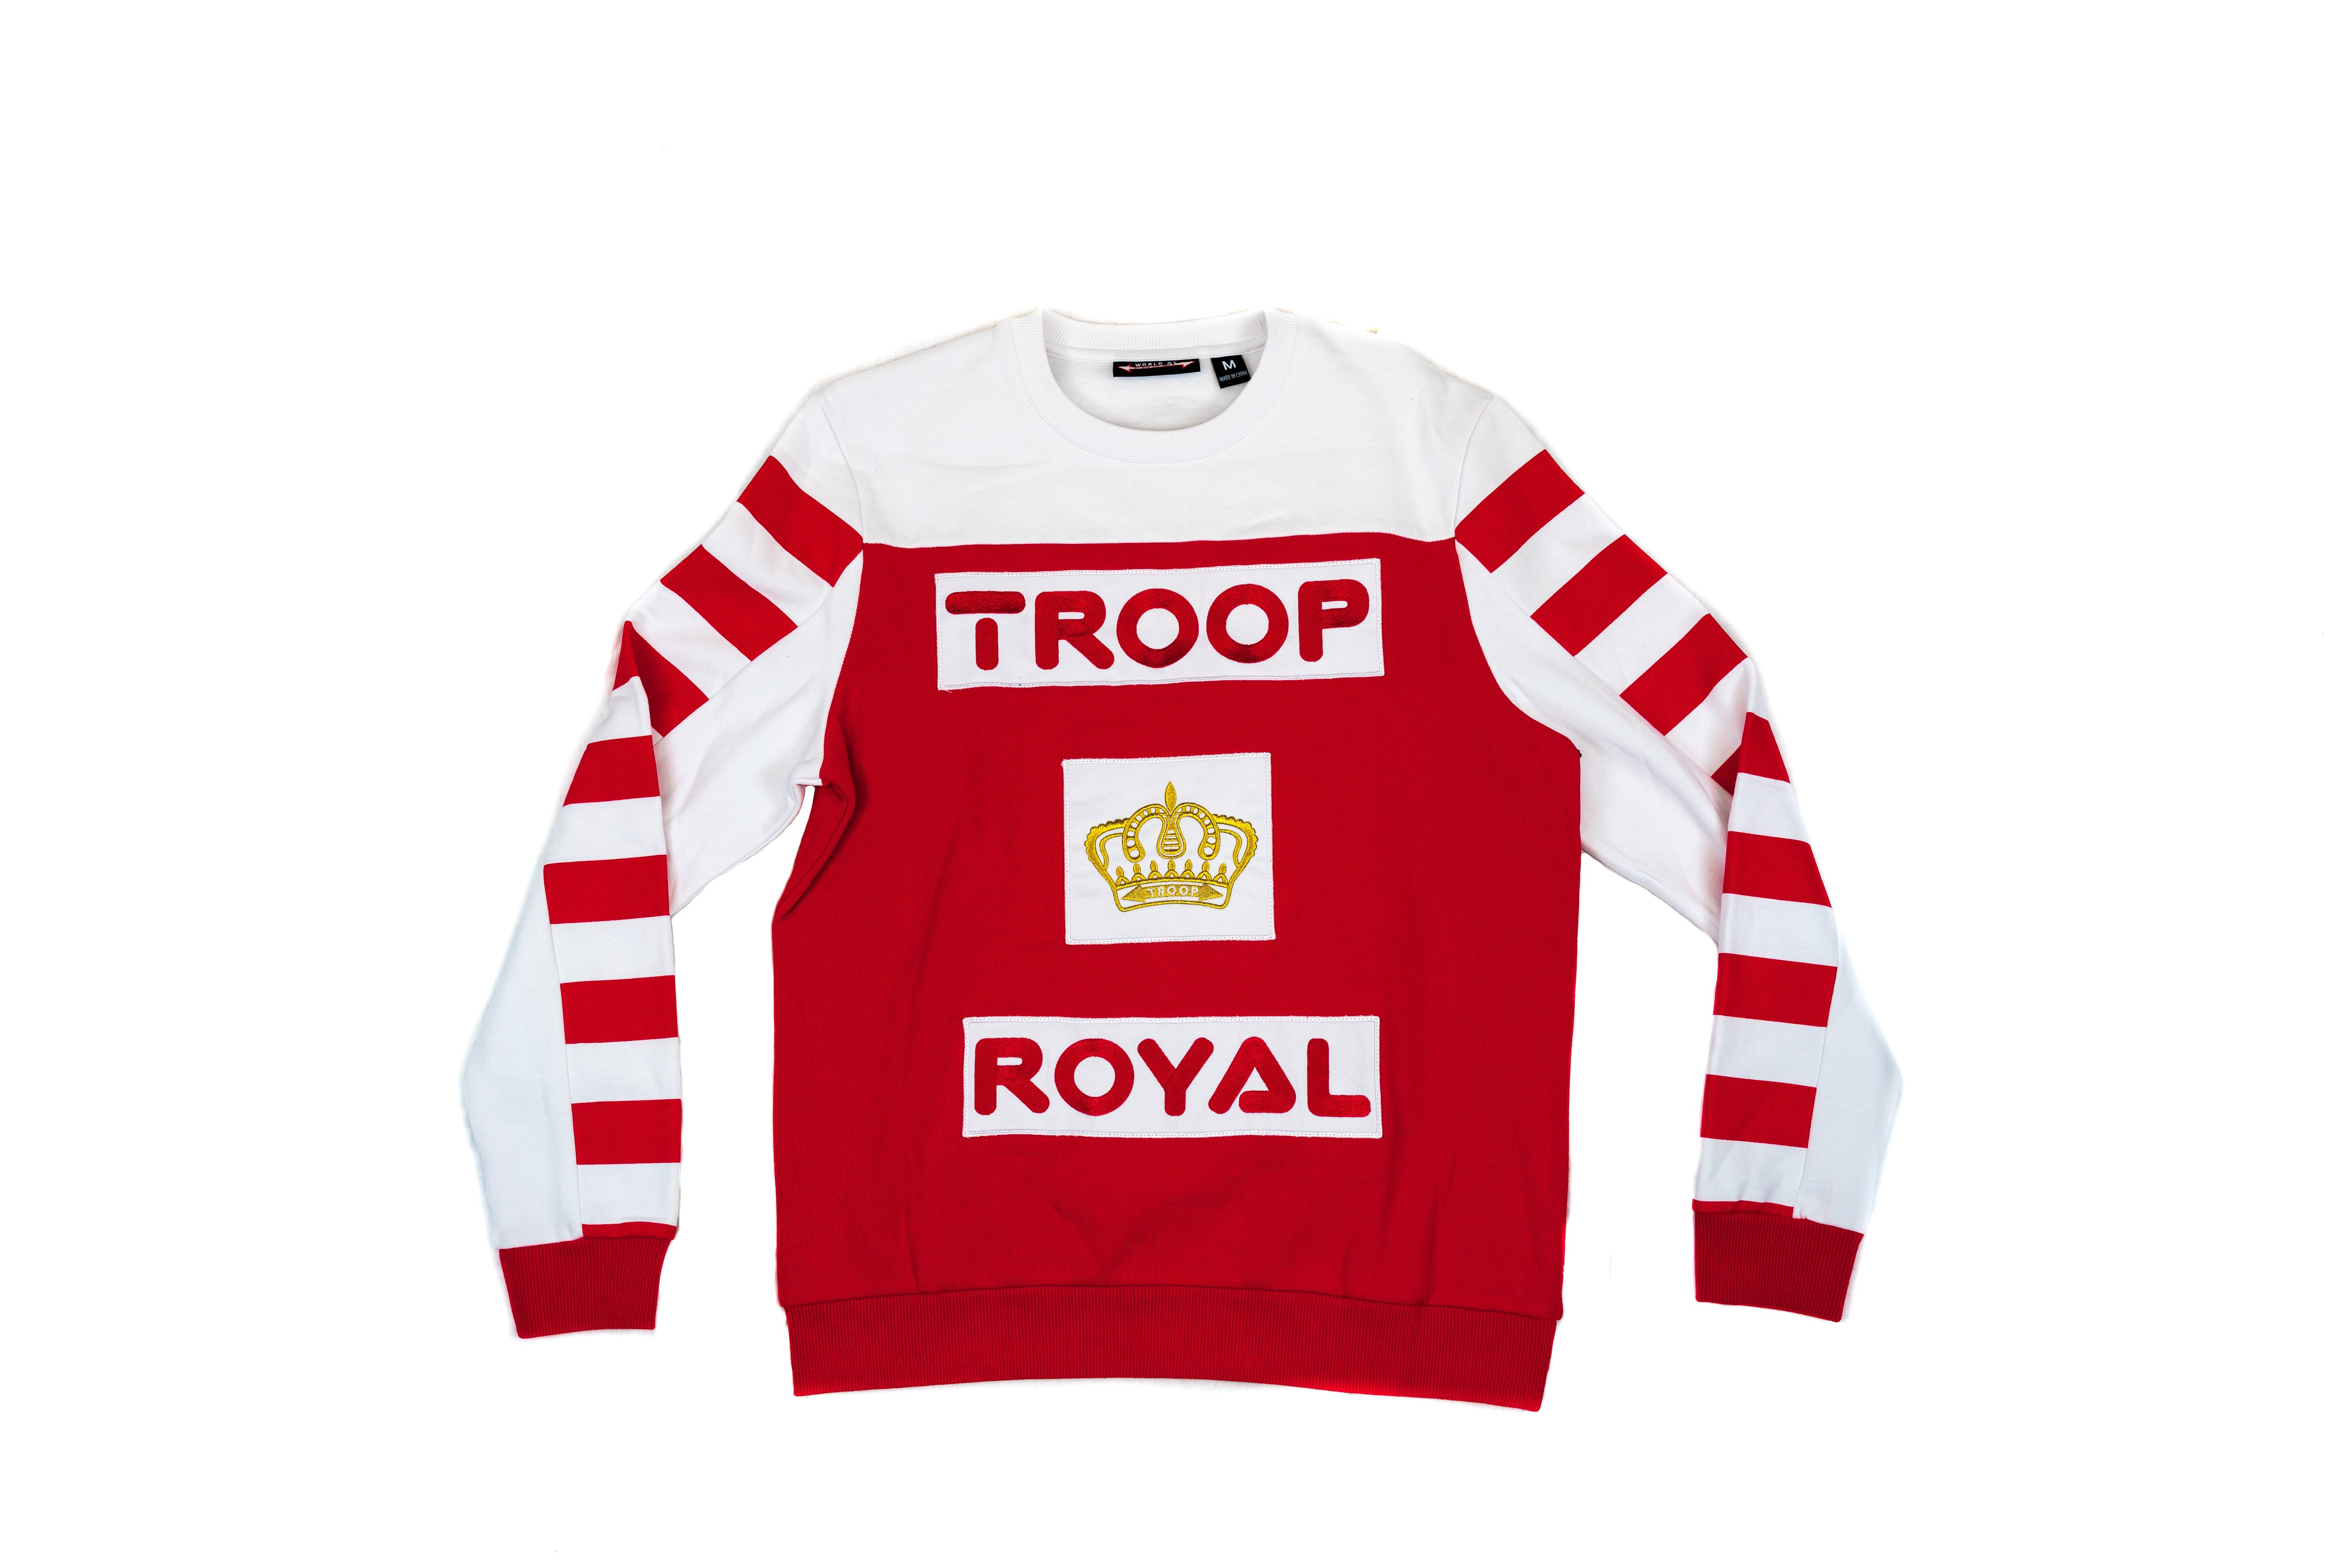 World Of Troop Royal Crew 80s Apparel